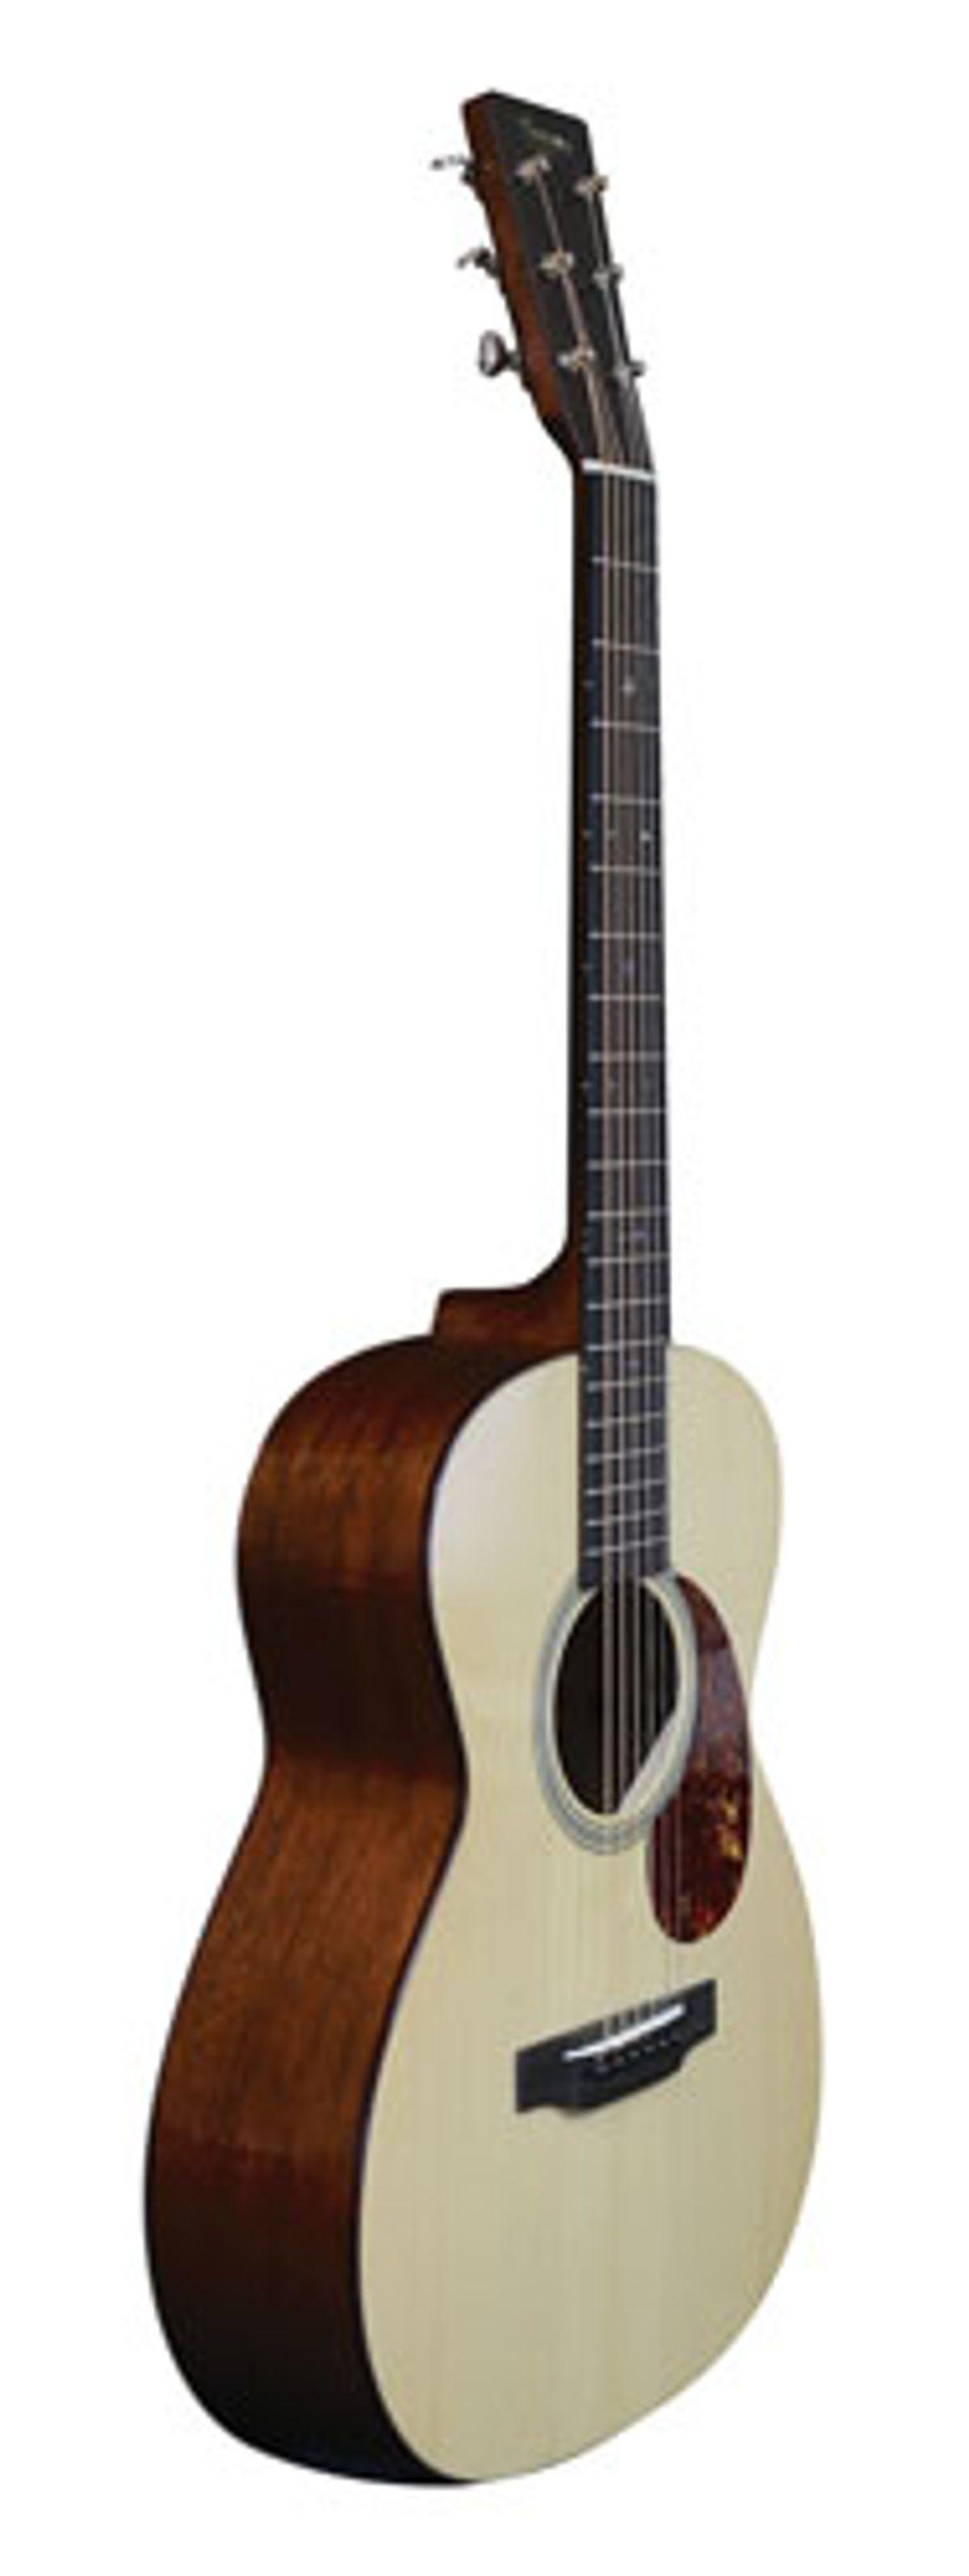 Preston Thompson Guitars Releases the 00-14